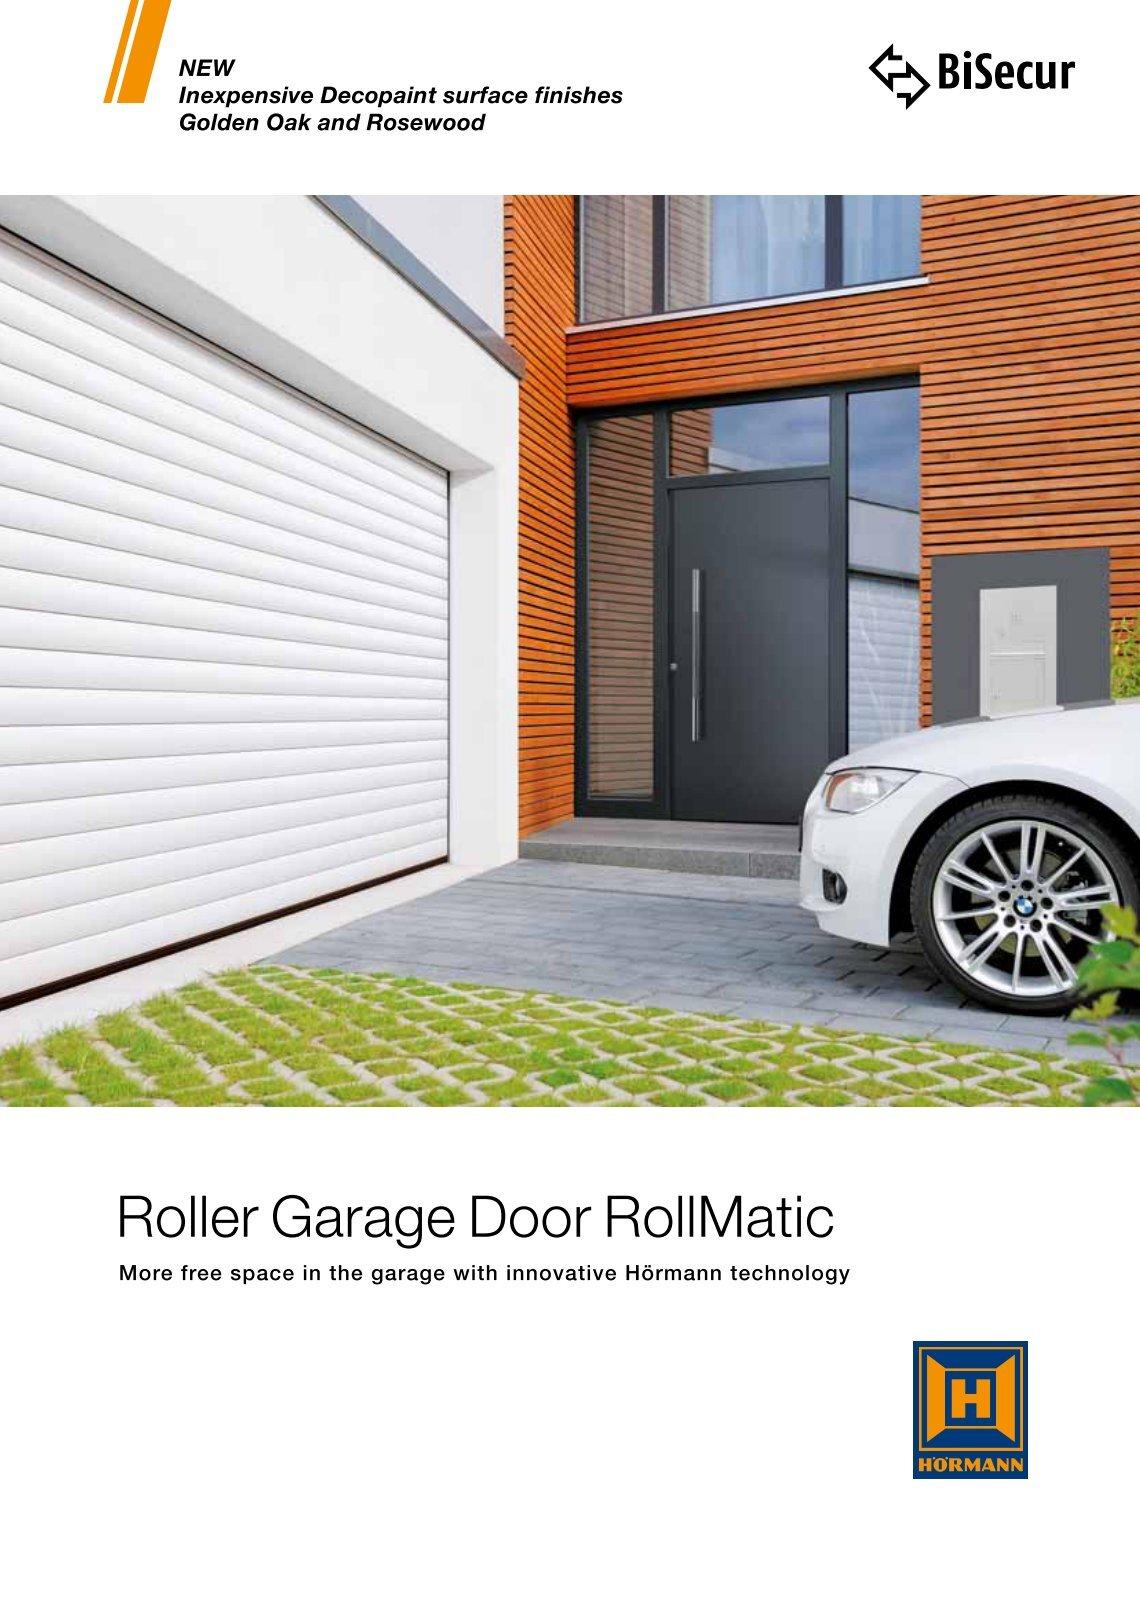 Protech garage doors ottawa wageuzi protech garage doors ottawa wageuzi bioresonanz kielfo Choice Image  sc 1 st  BIORESONANZ-KIEL.INFO & Protech Garage Doors Ottawa Choice Image - Doors Design Ideas pezcame.com